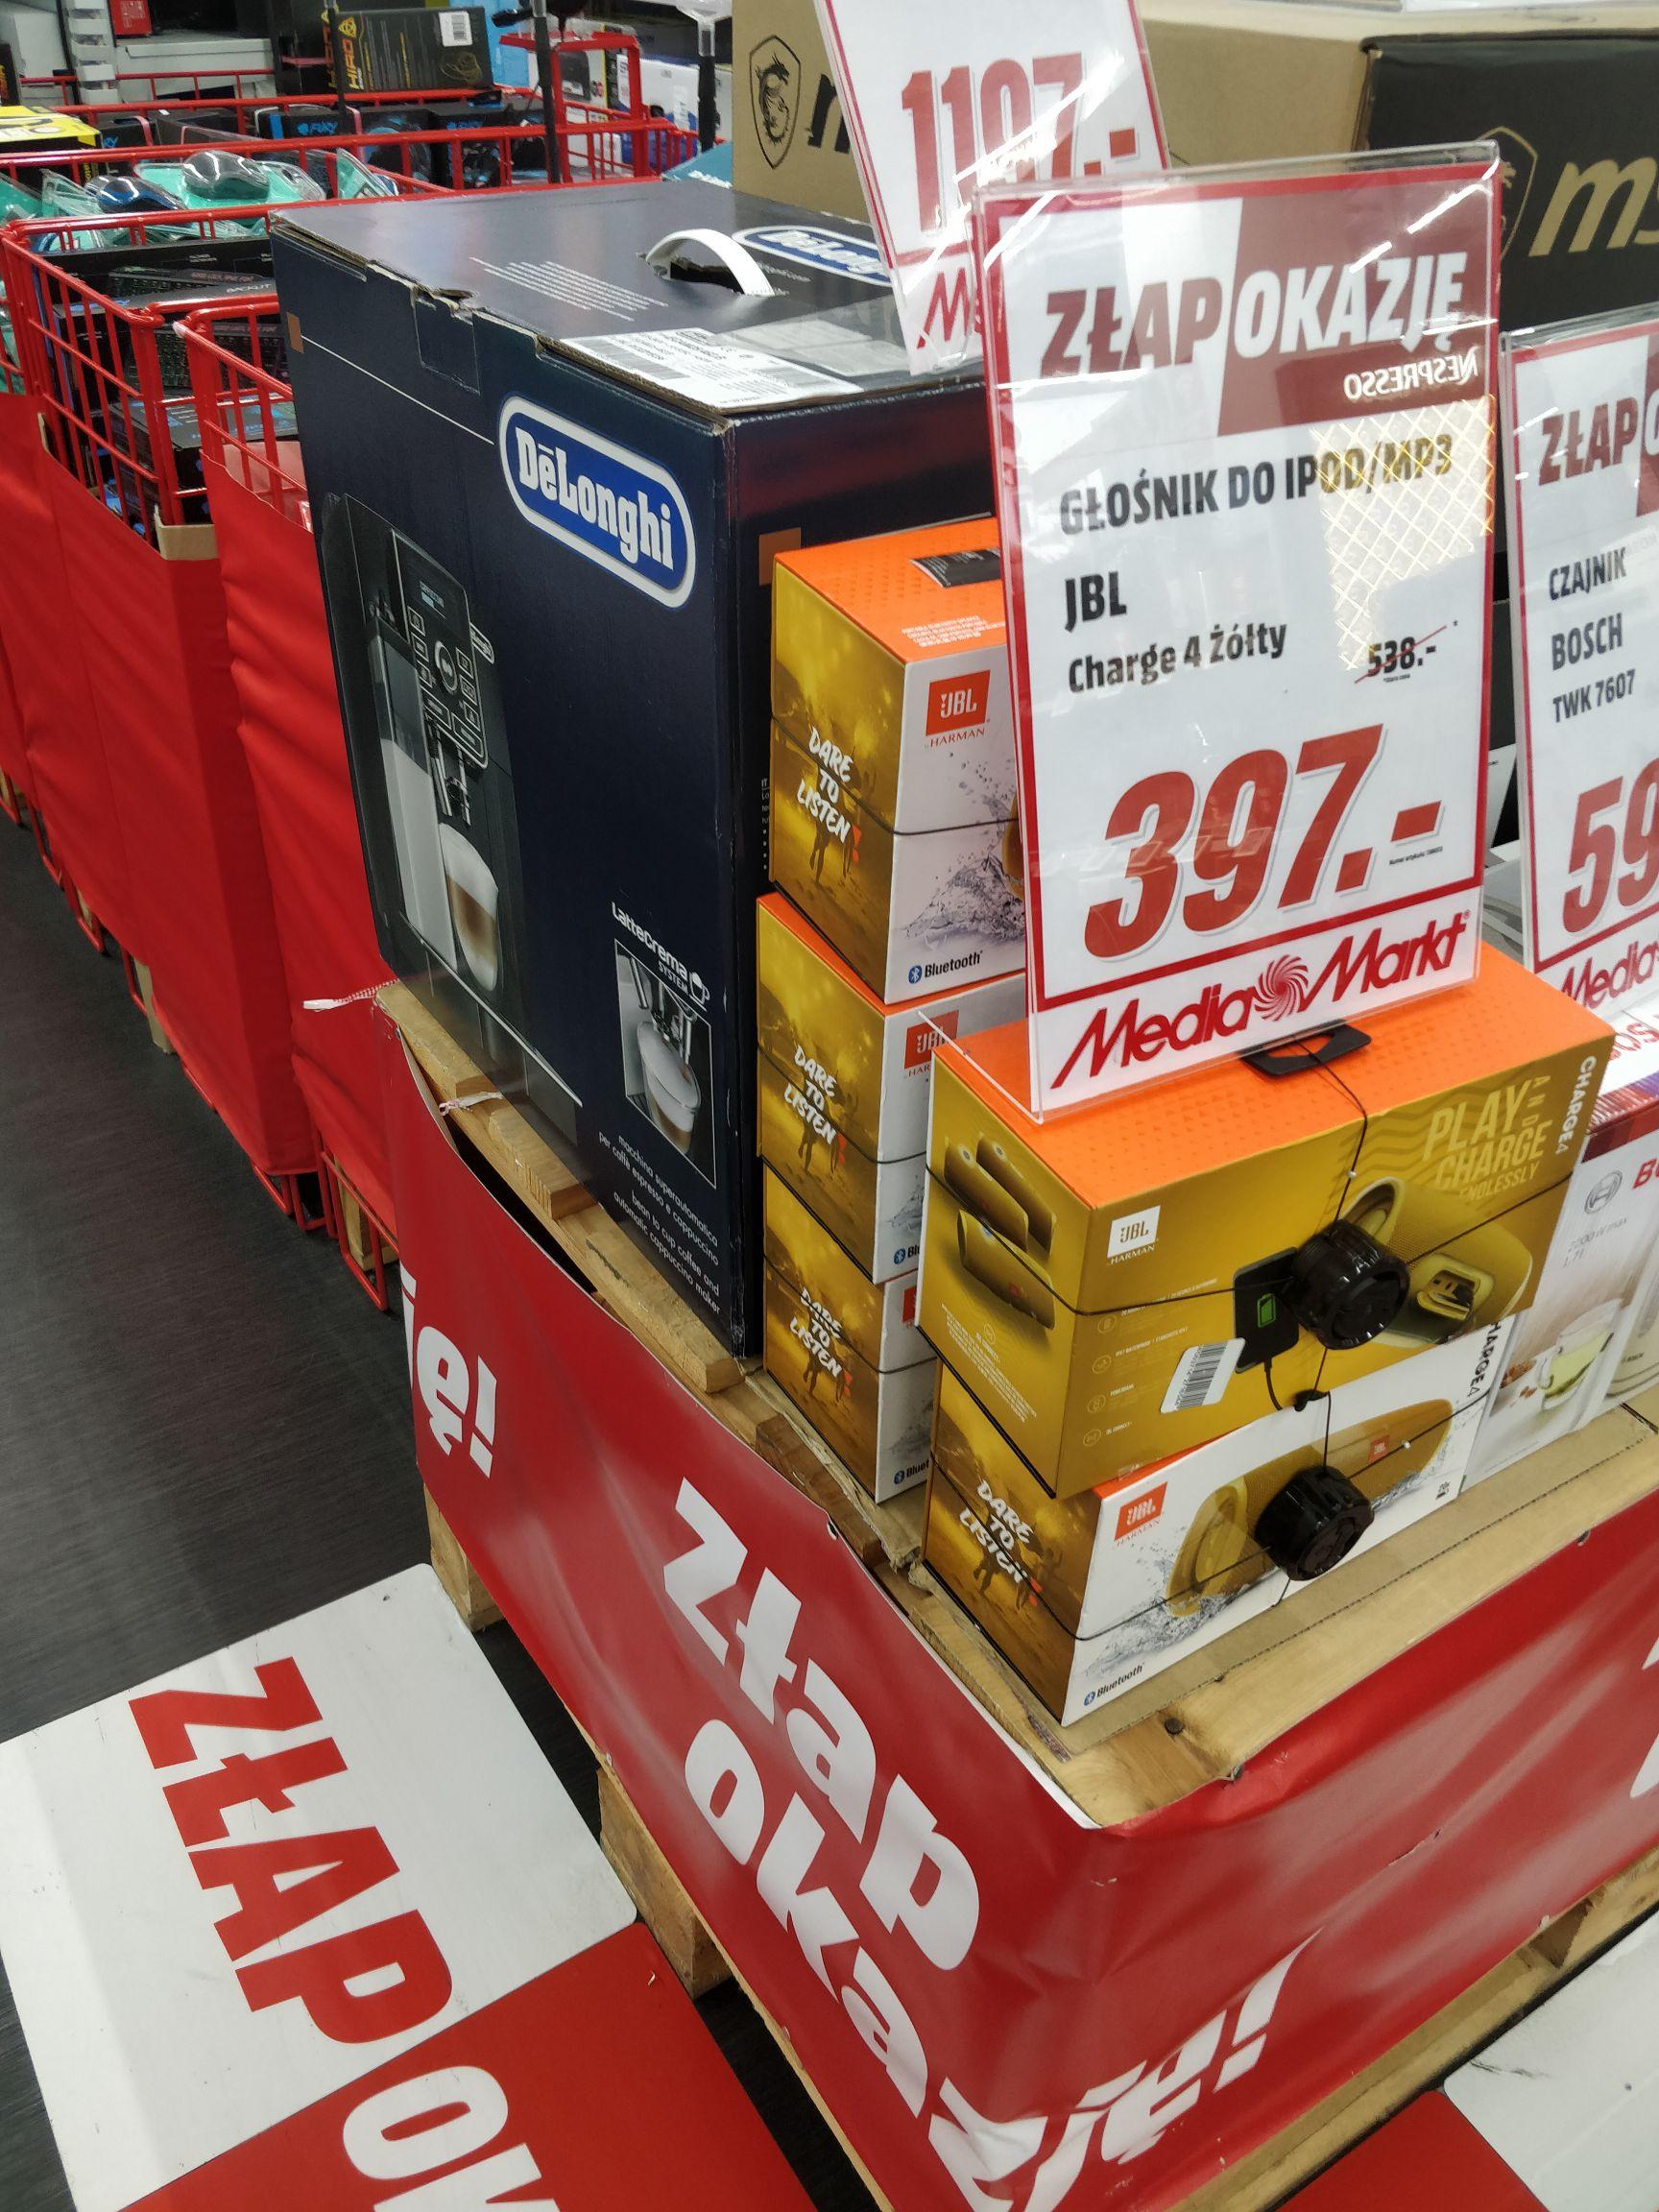 JBL Charge 4 żółty, Media Markt Wroclavia